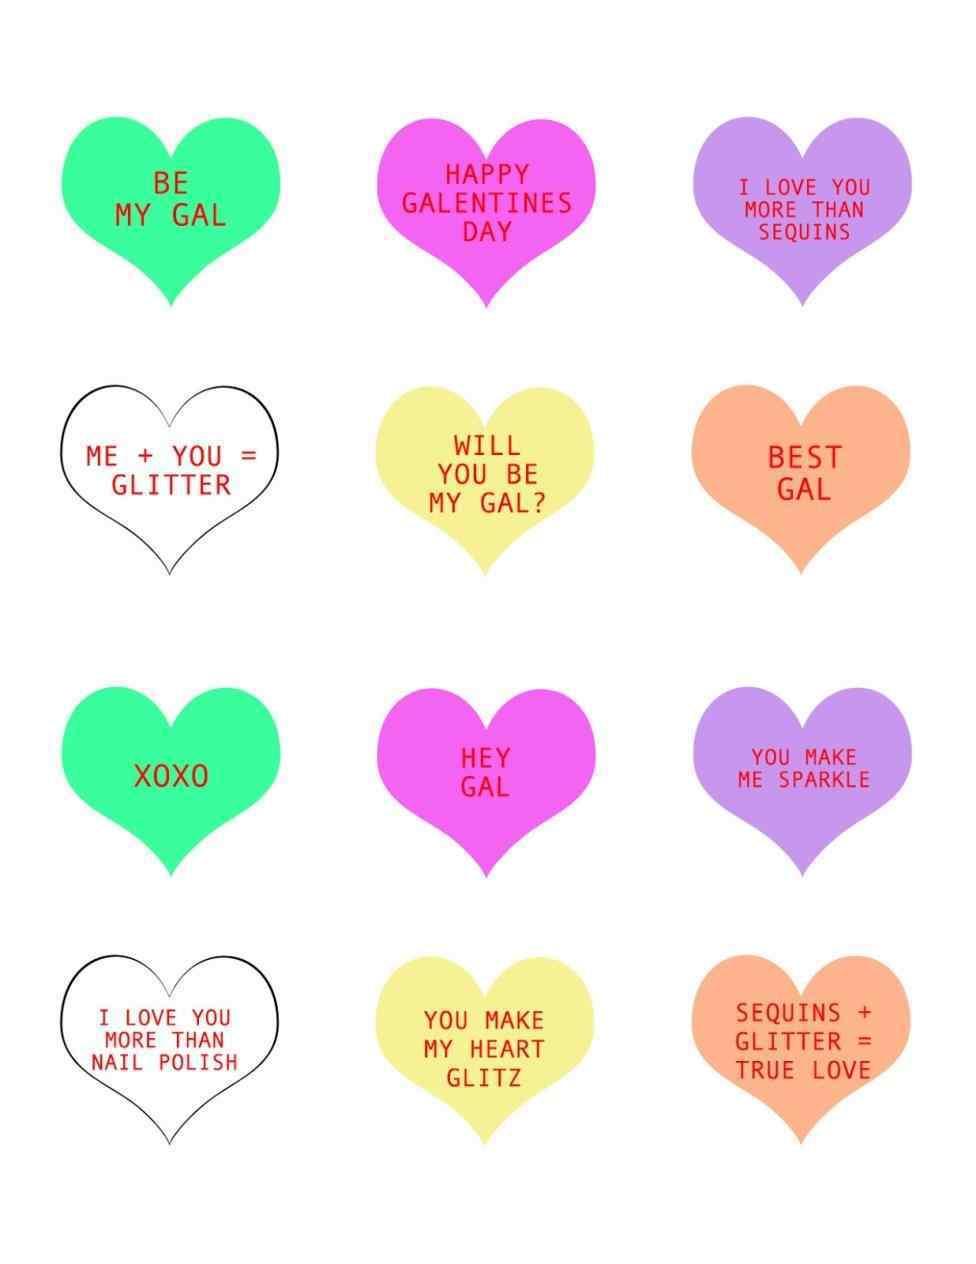 976x1264 Valentine Day Party Clip Art Your Meme Source